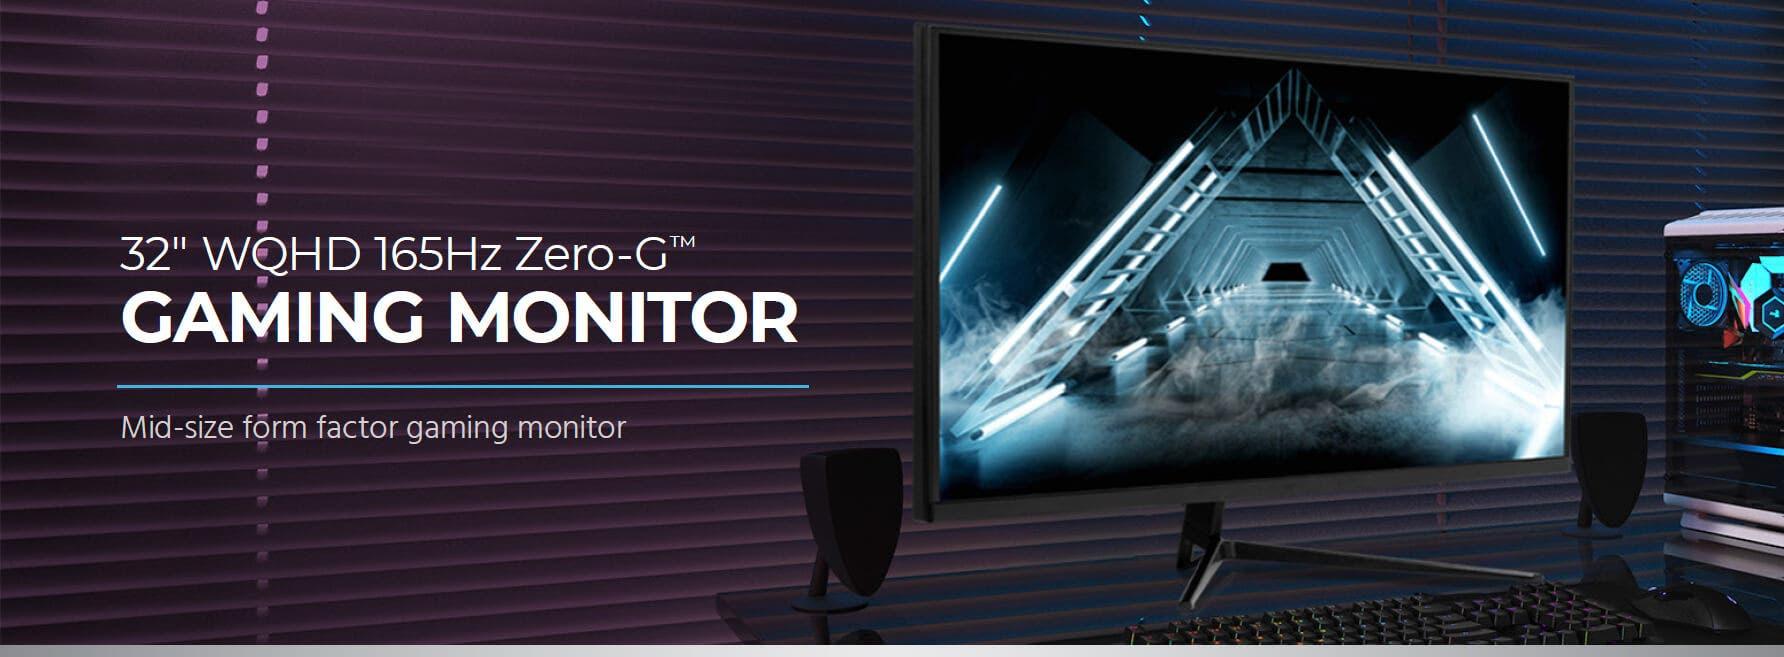 32in Zero-G Gaming Monitor